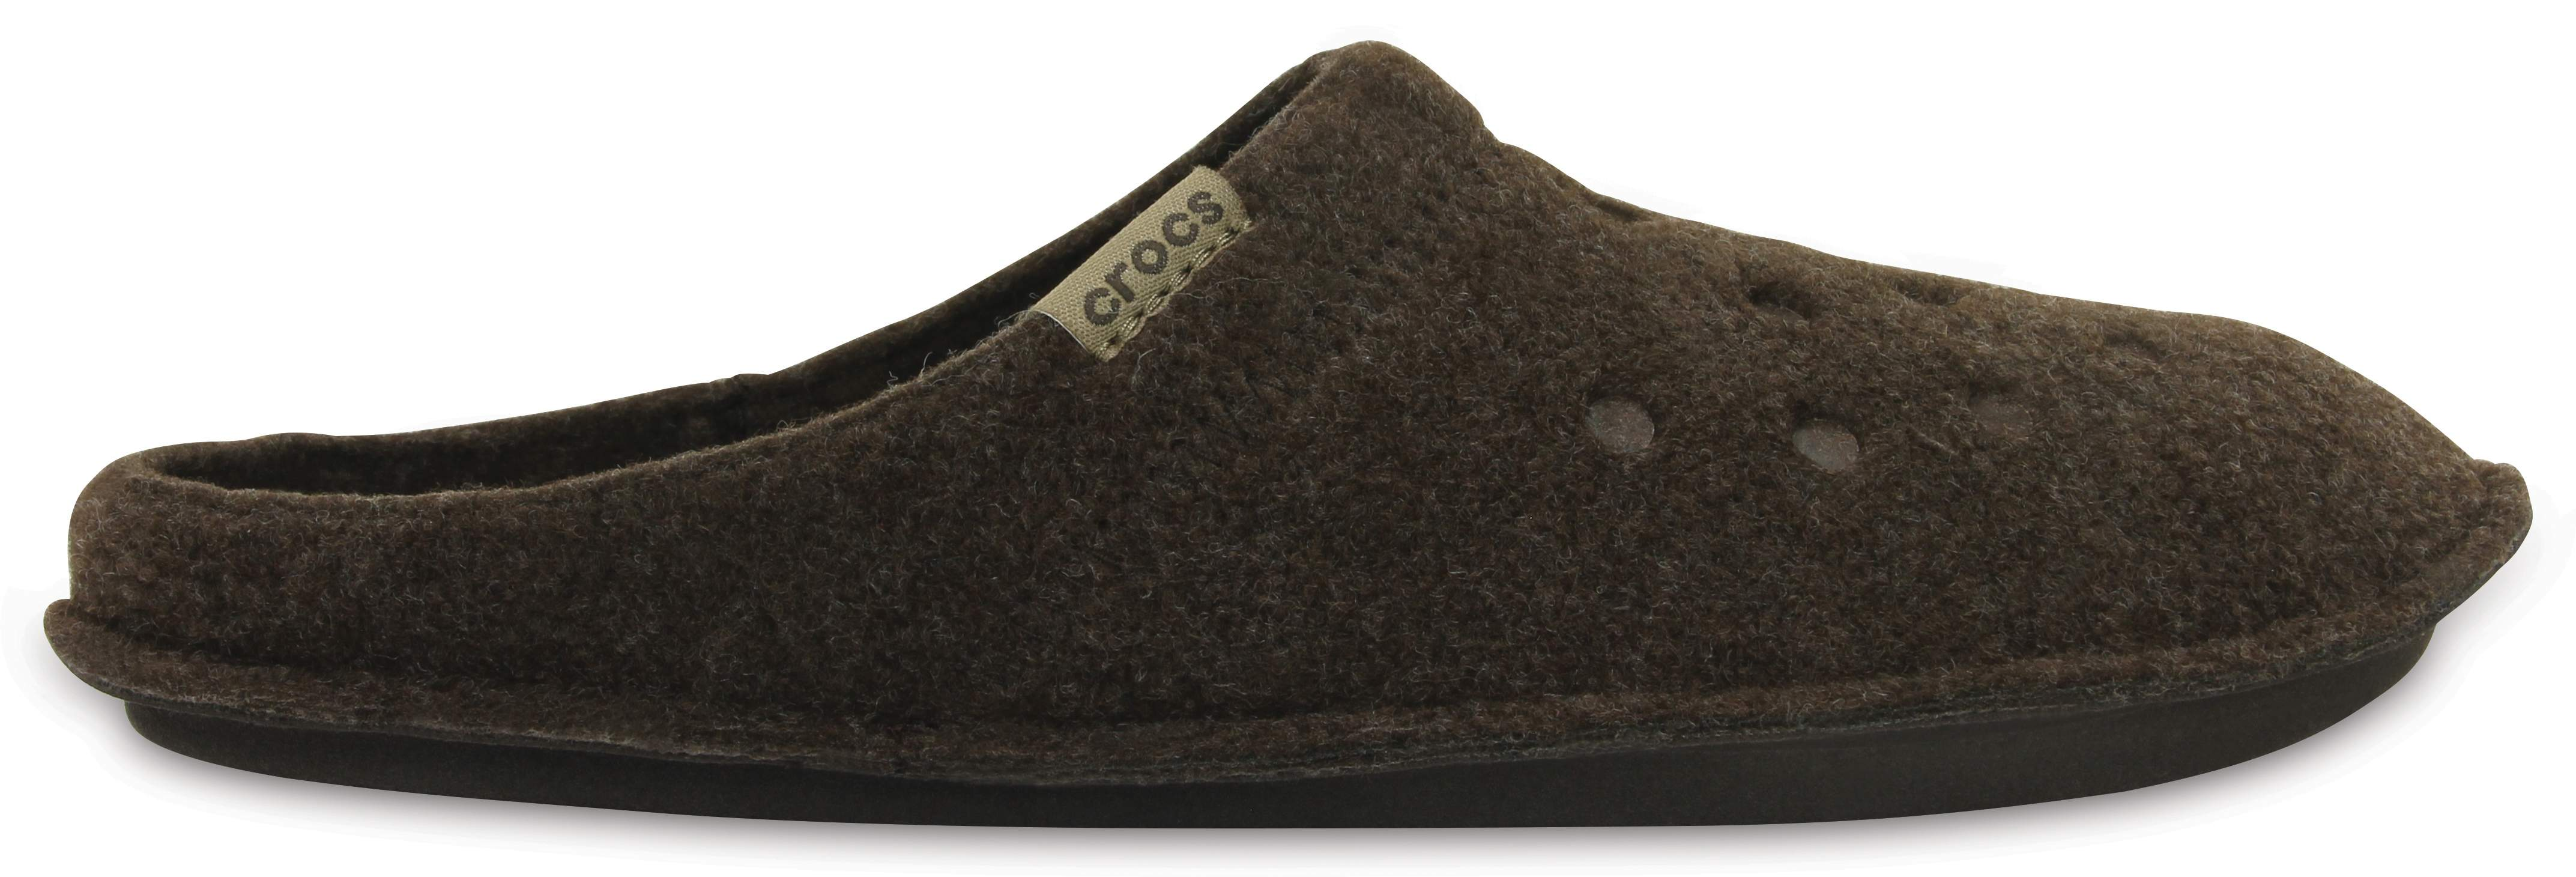 Hausschuhe CROCS - Classic Slipper 203600 Black/Black